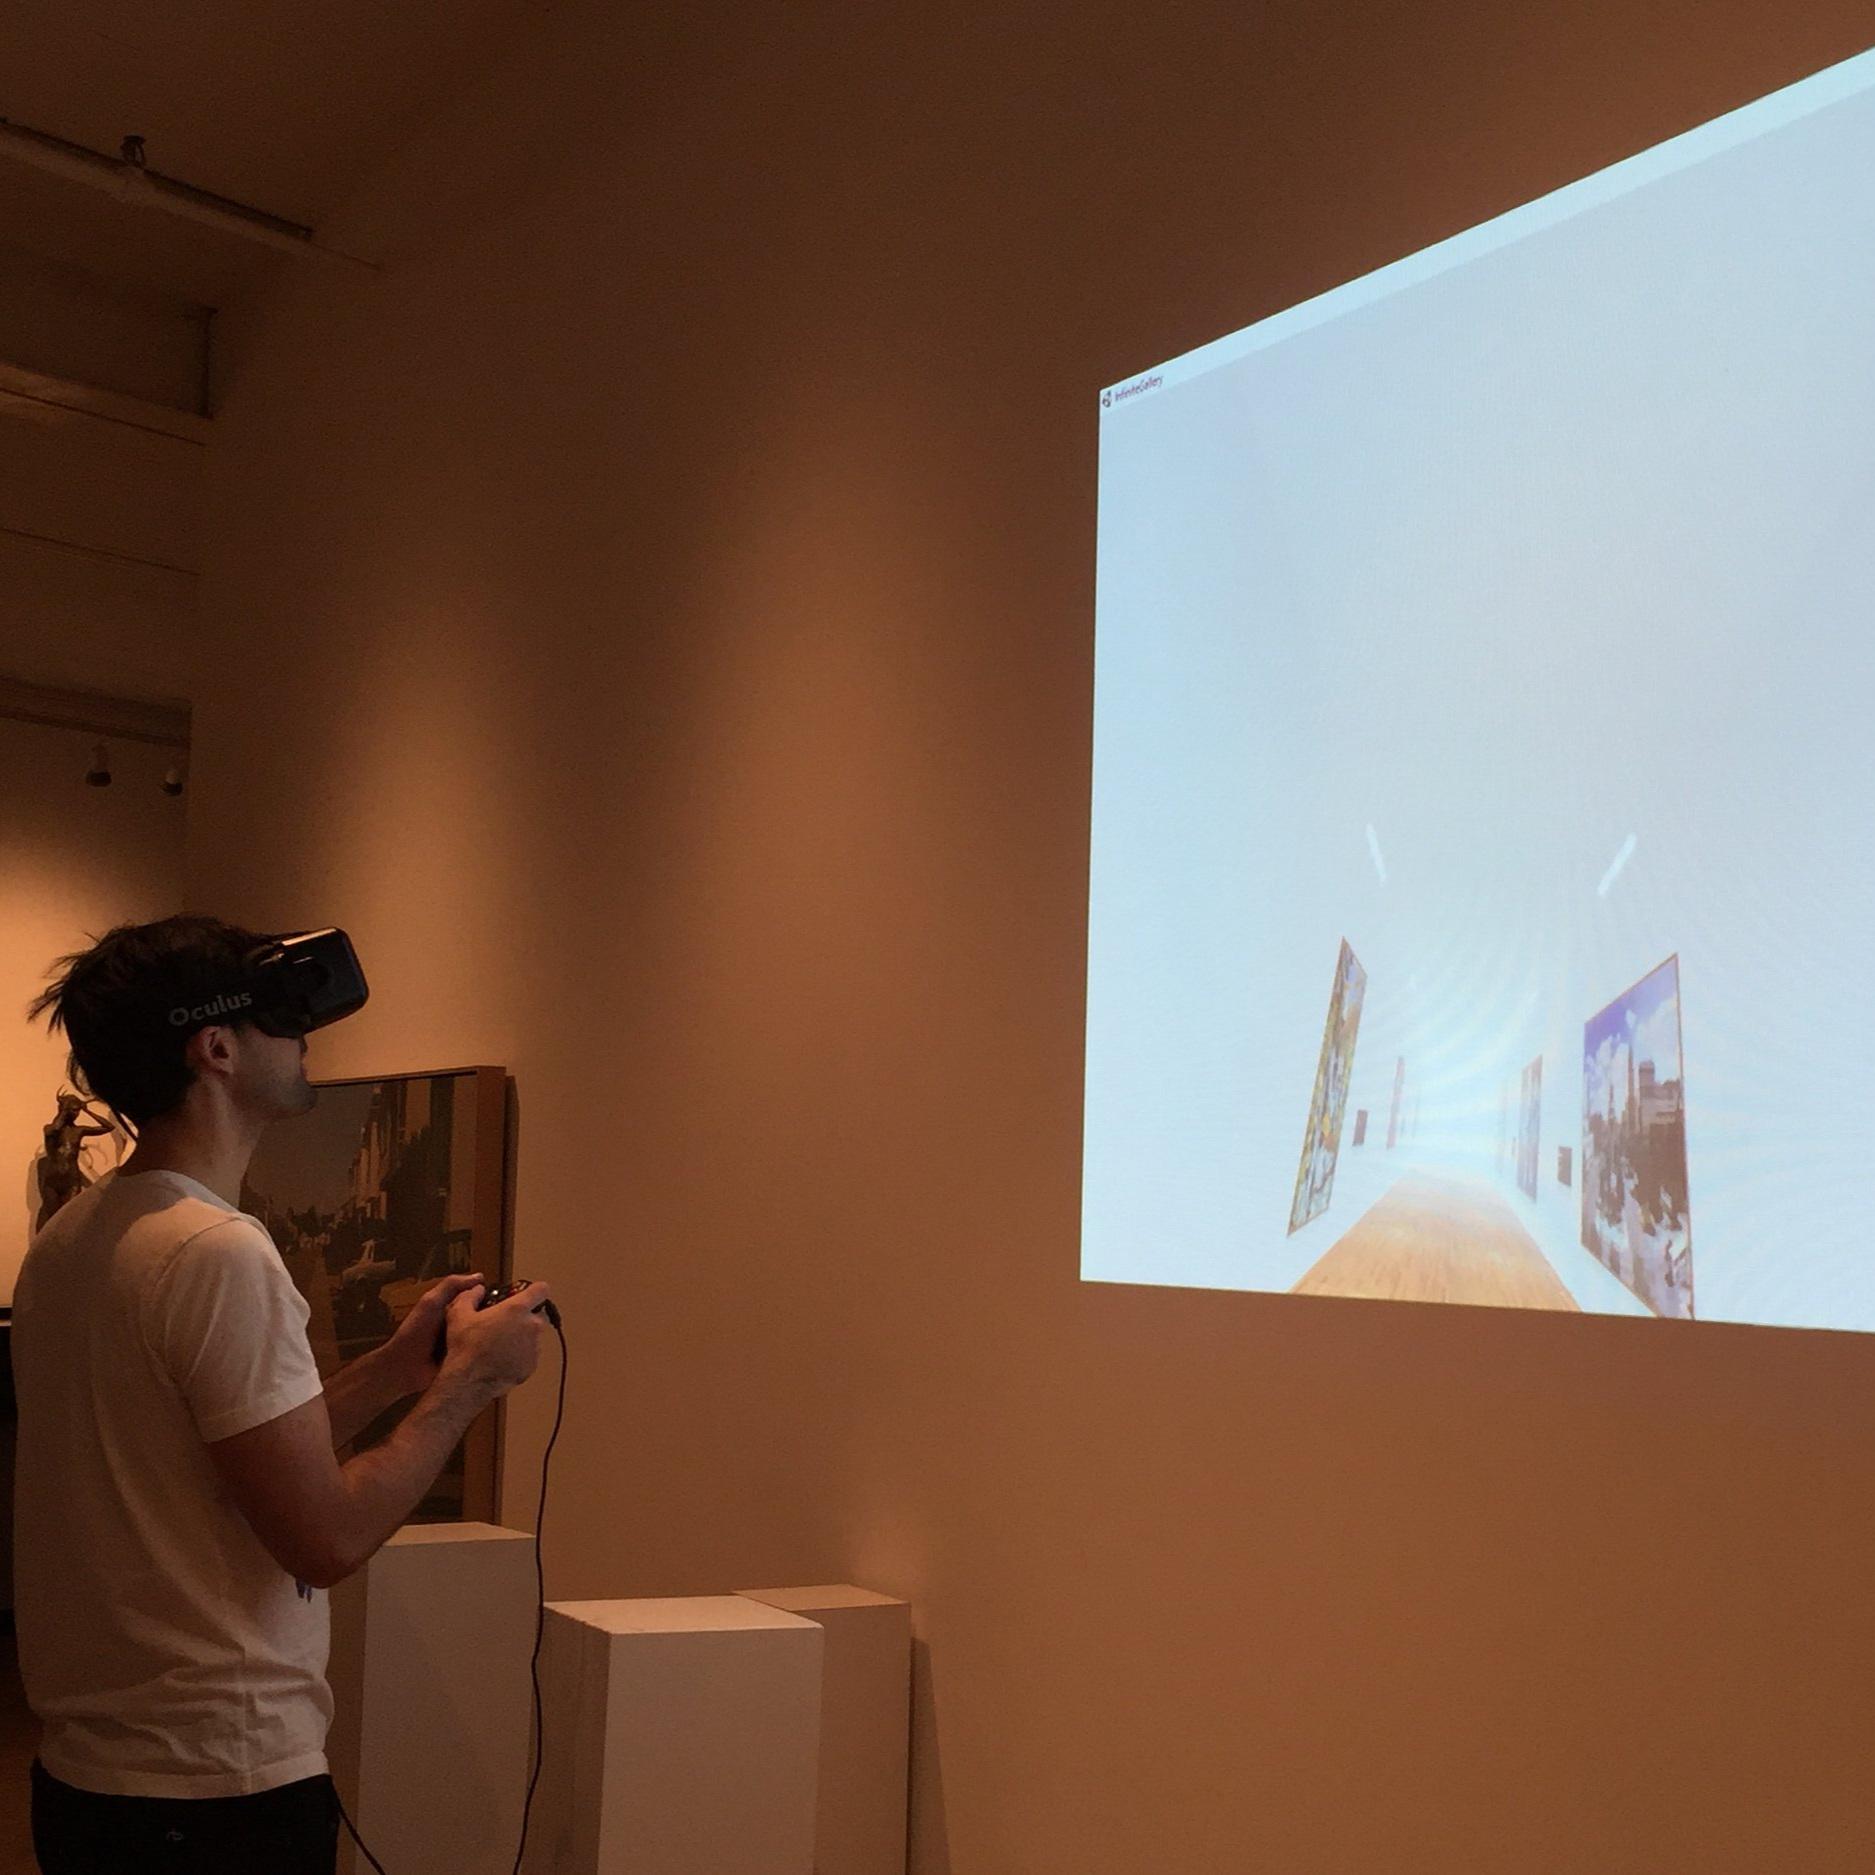 Virtual - An Immersive Art ExperienceOctober 5 - 7, 2016